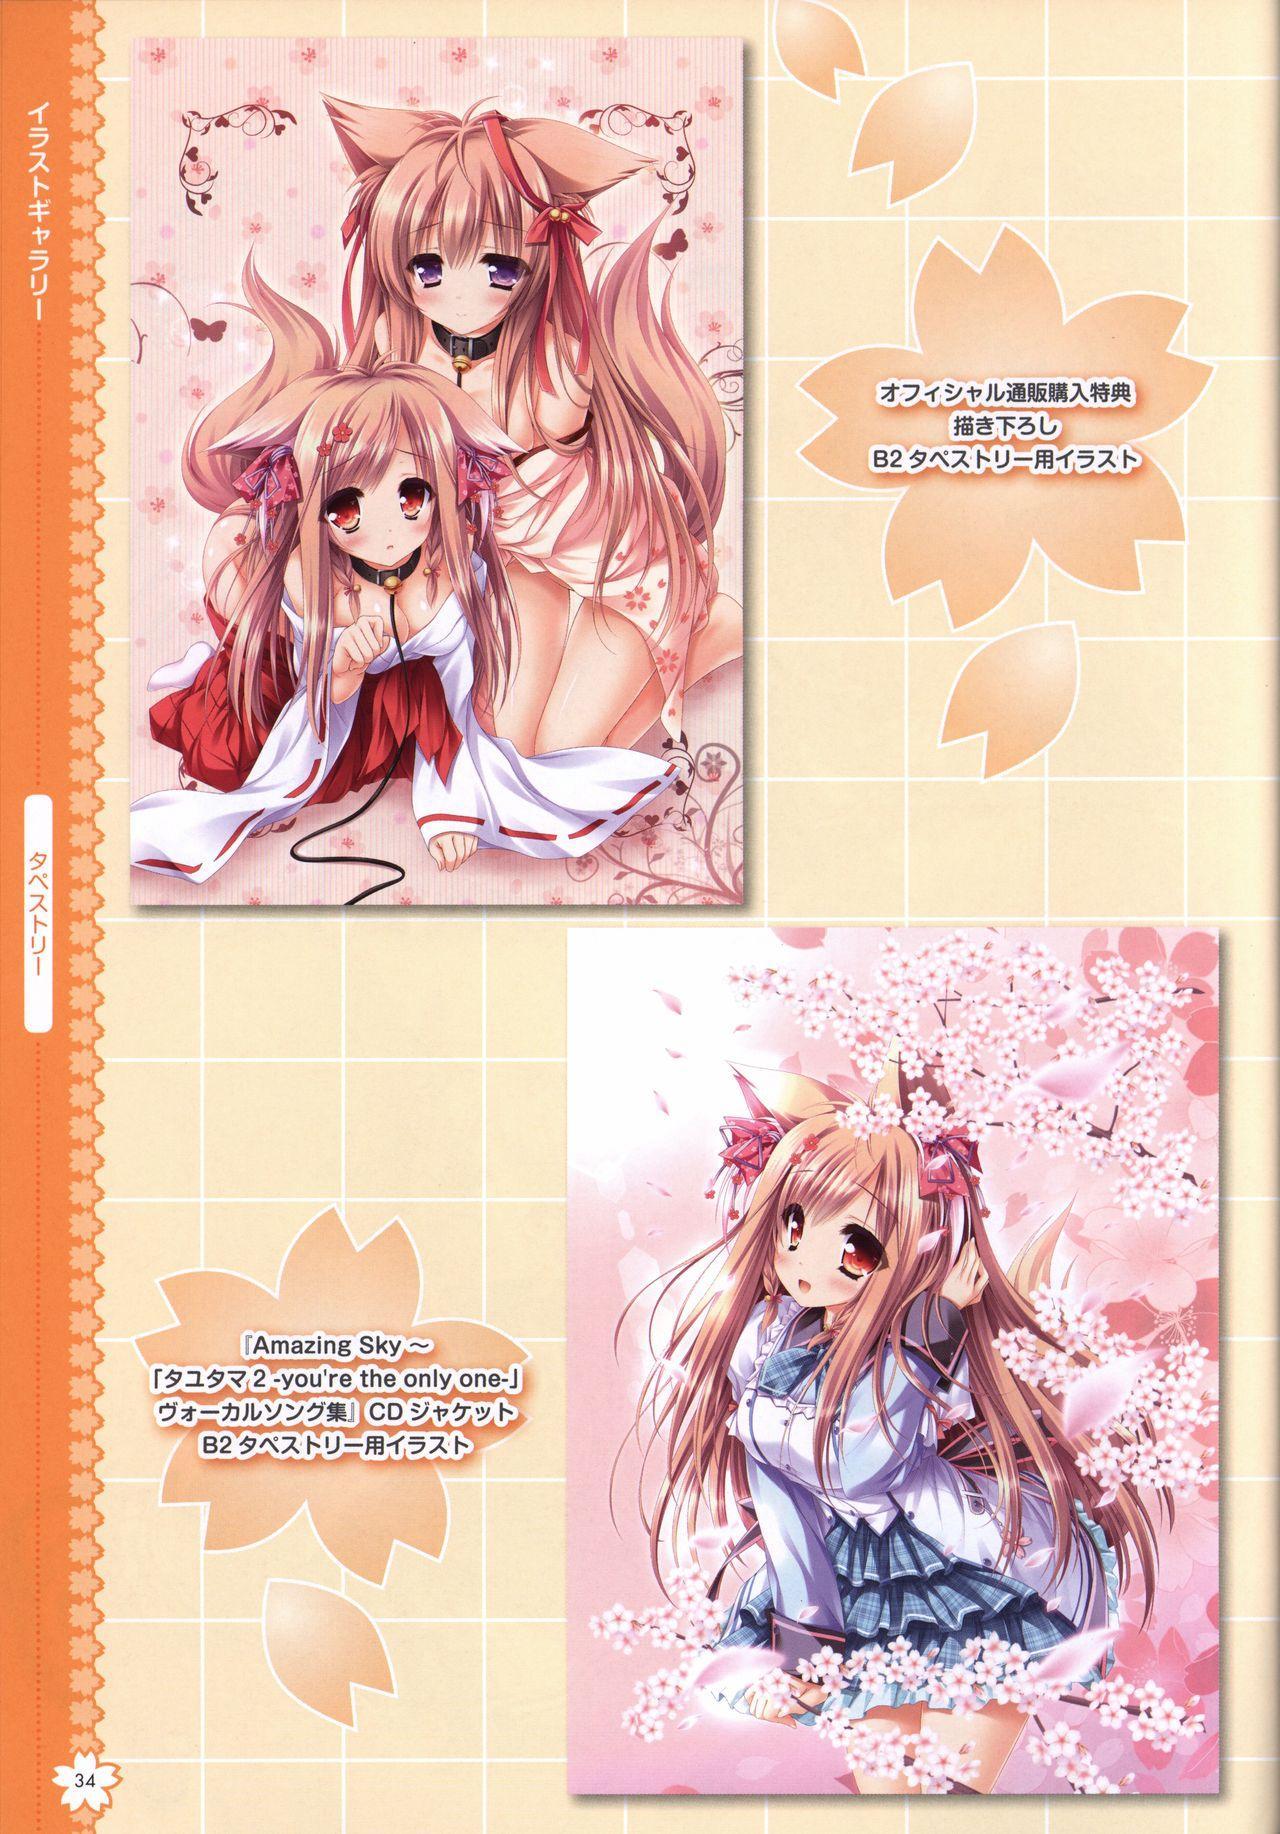 Tayutama2 Visual Art Fanbook 36